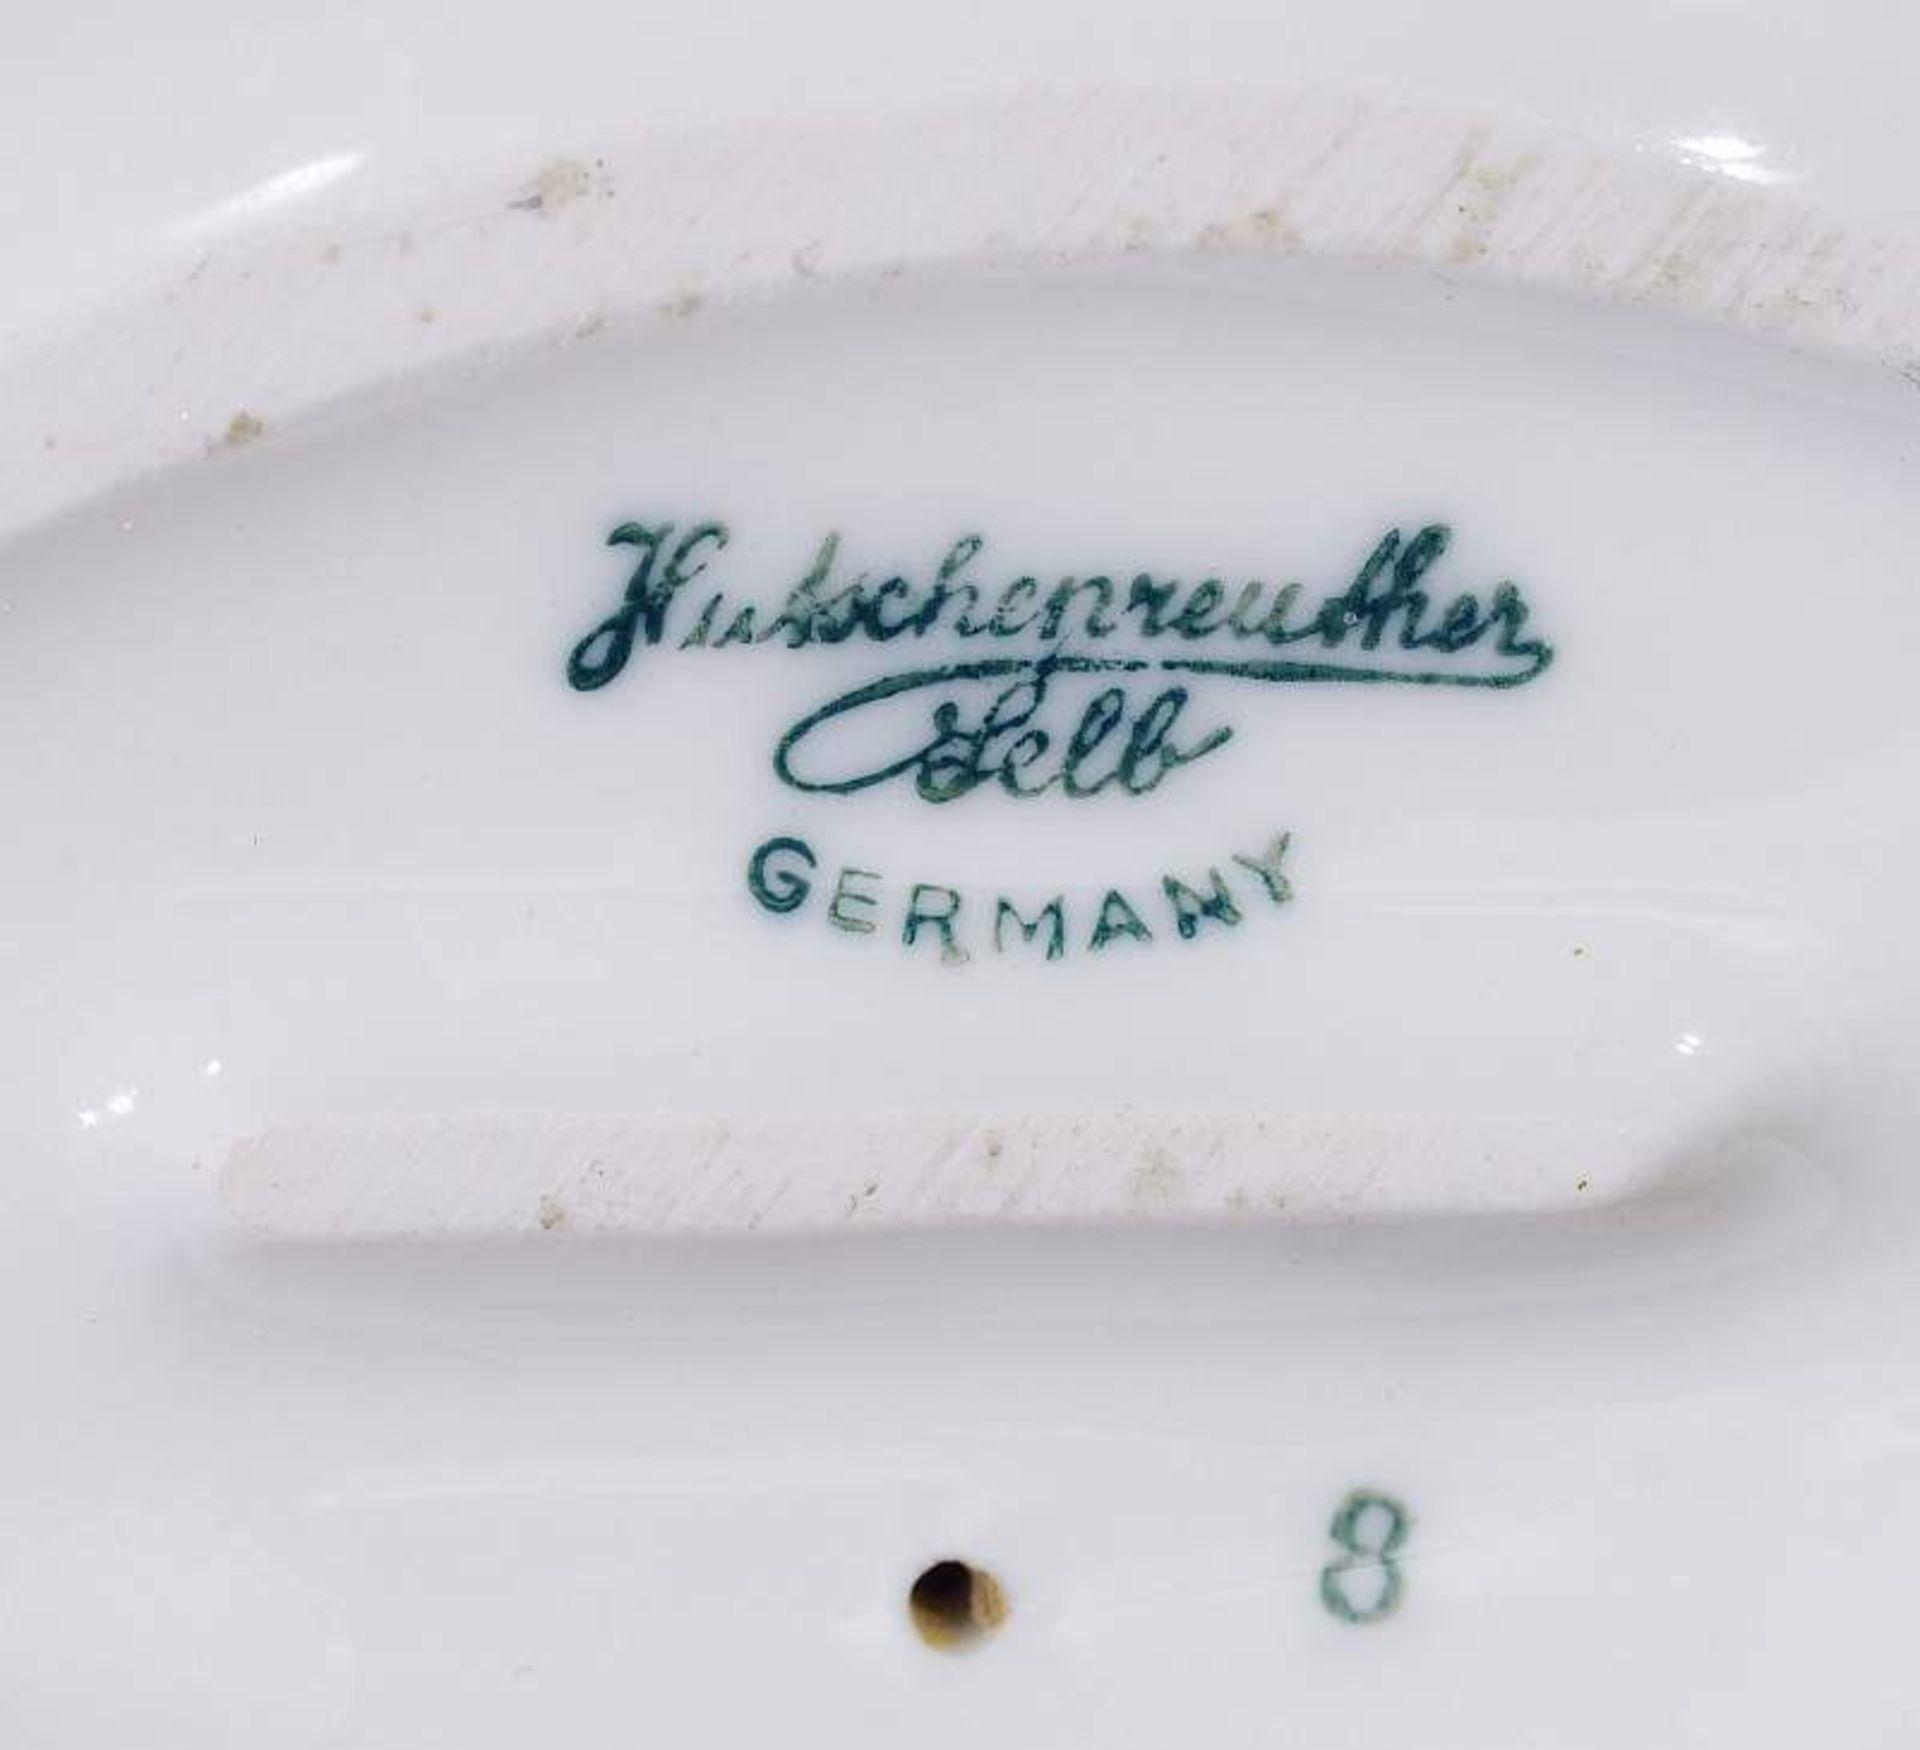 "Figurengruppe "" Springende Fohlen"". HUTSCHENREUTHER Selb Germany. Figurengruppe ""Springende Fohlen"". - Bild 4 aus 4"